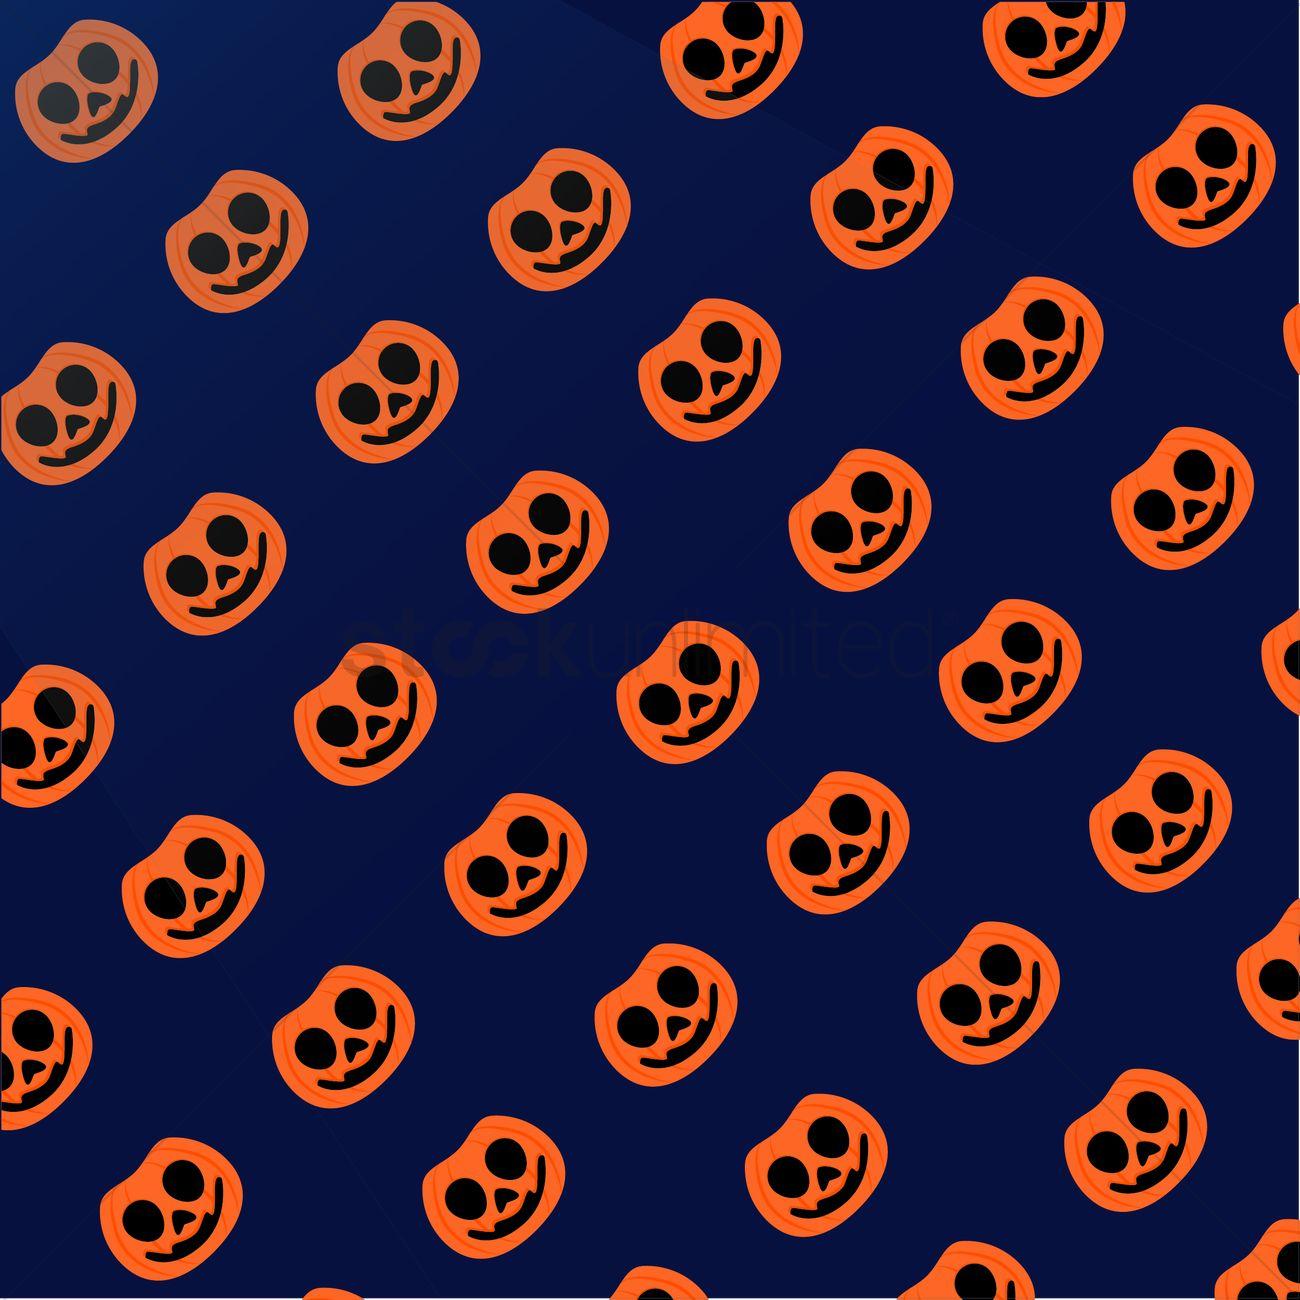 Jack O Lantern Halloween Background Vector Image 1260108 Stockunlimited